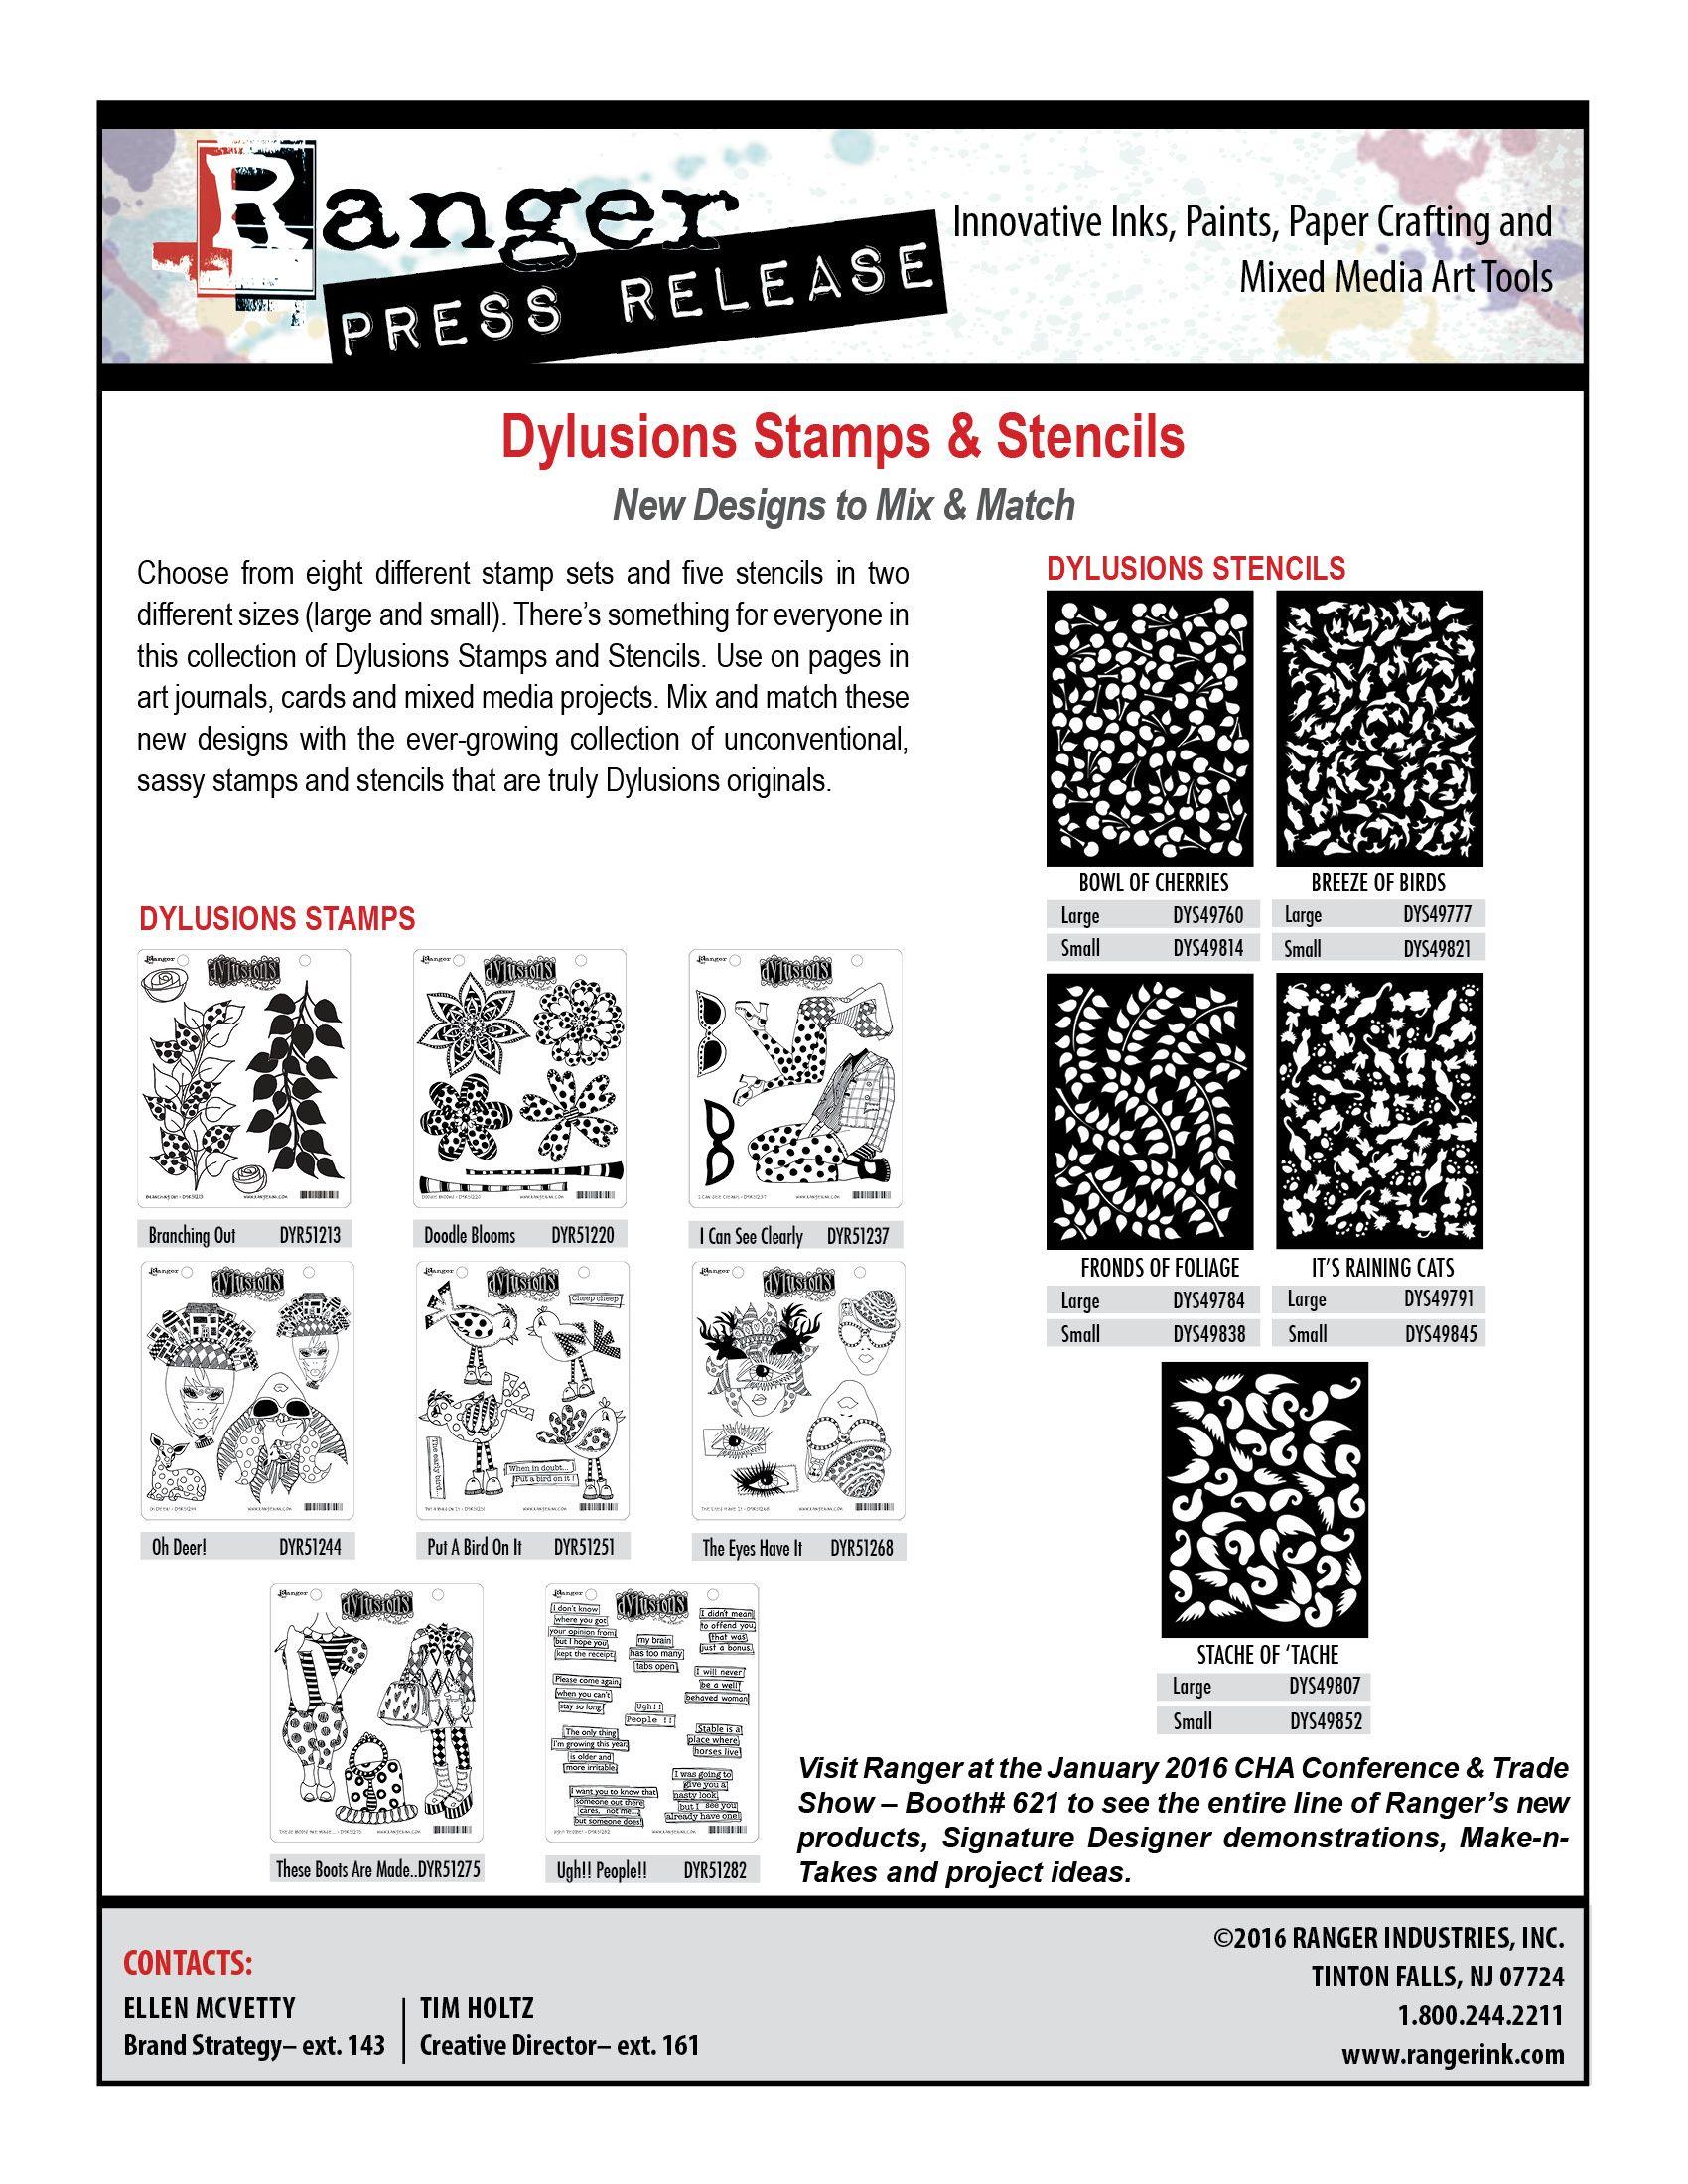 Dylusions Stamps Stencils PR-2016